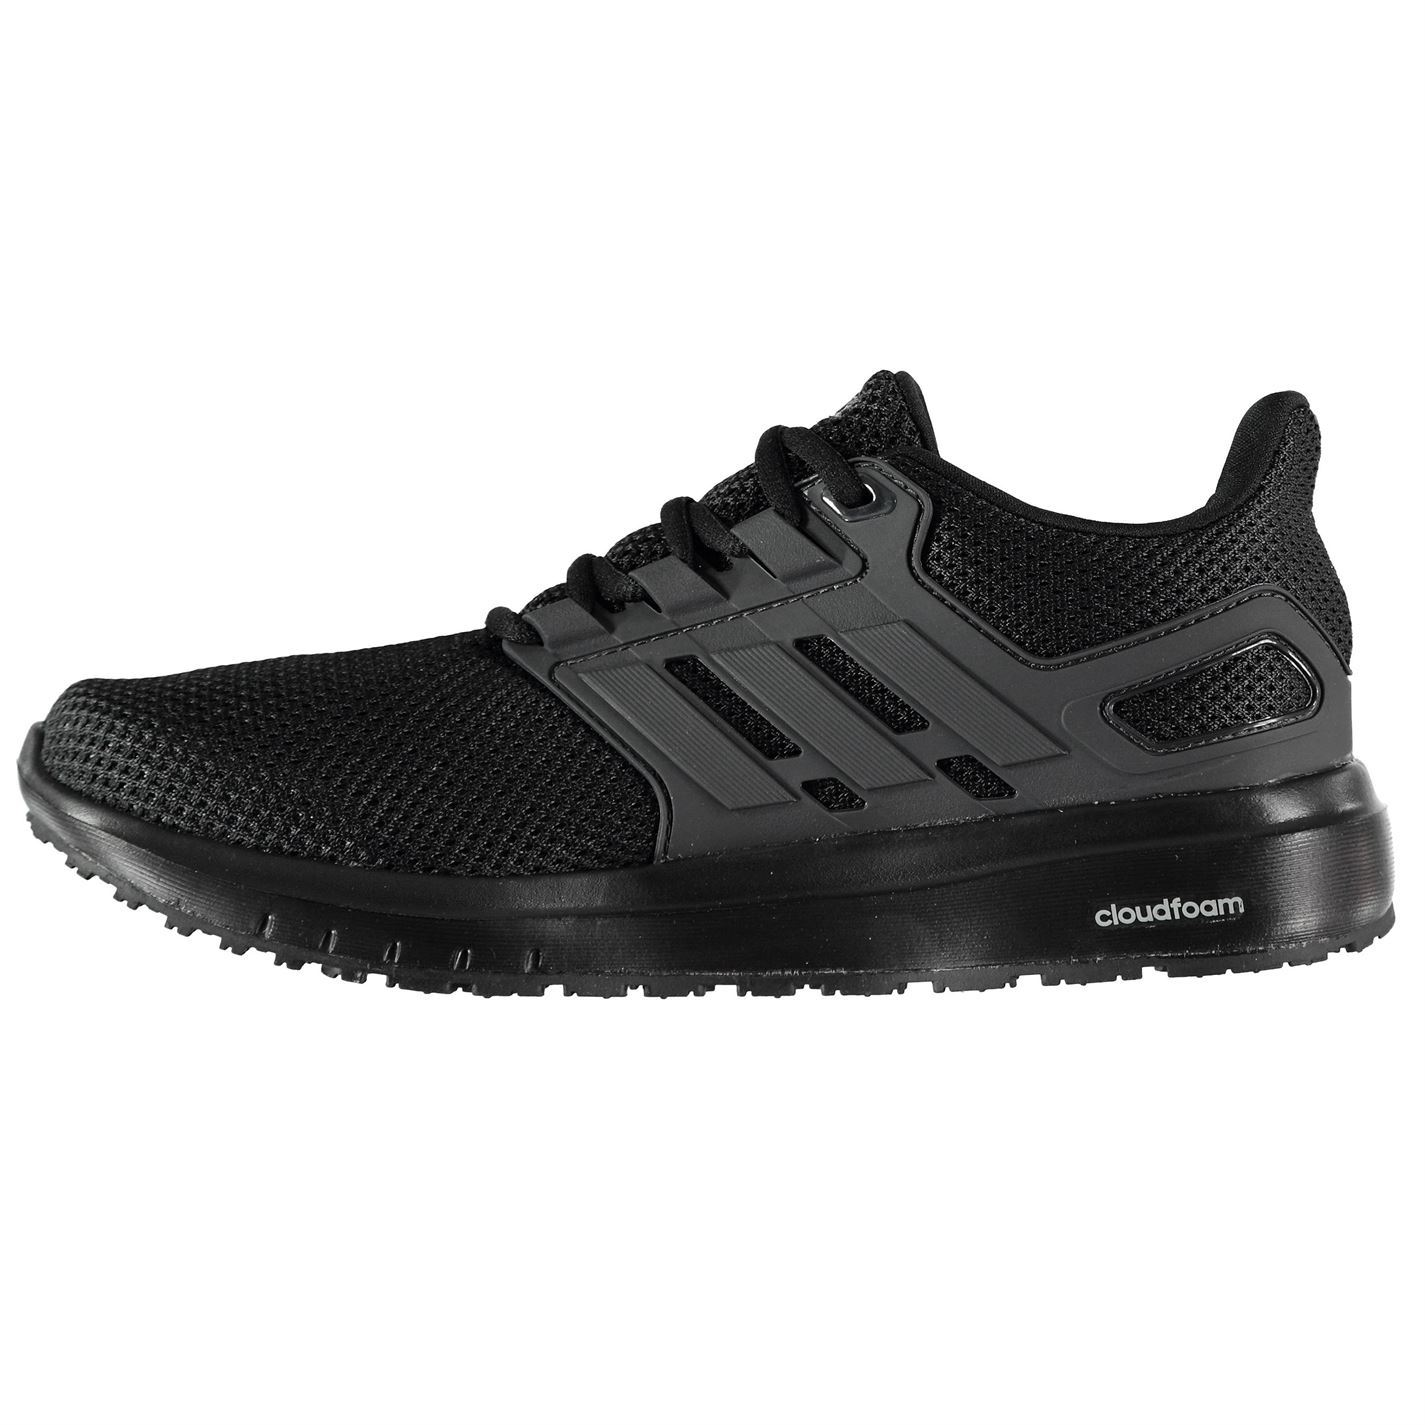 eba924d8 adidas Energy Cloud 2 Running Shoes Mens Black Jogging Trainers Sneakers